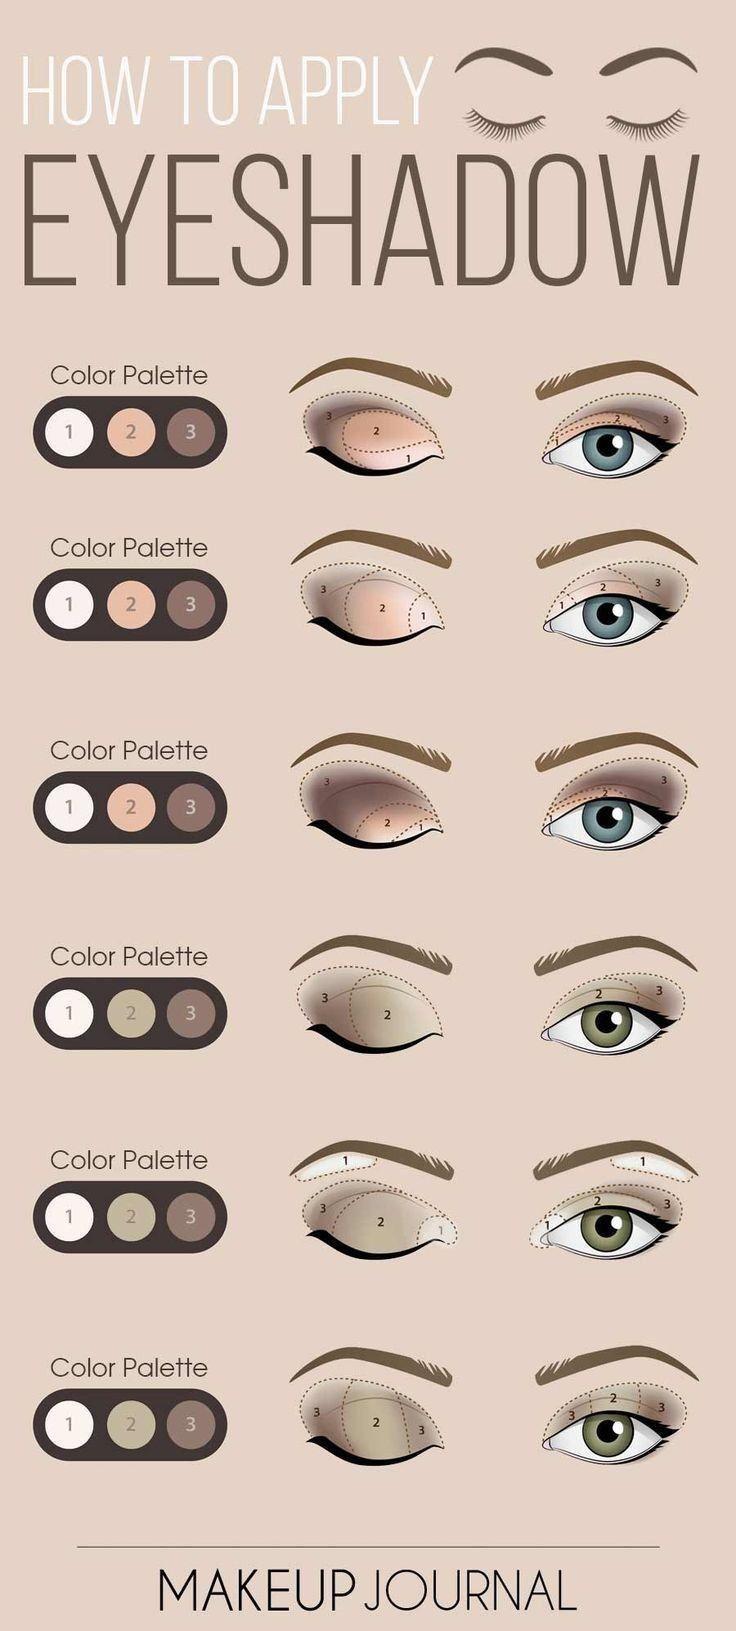 How to apply eyeshadow  Makeup secret, Eye makeup tutorial